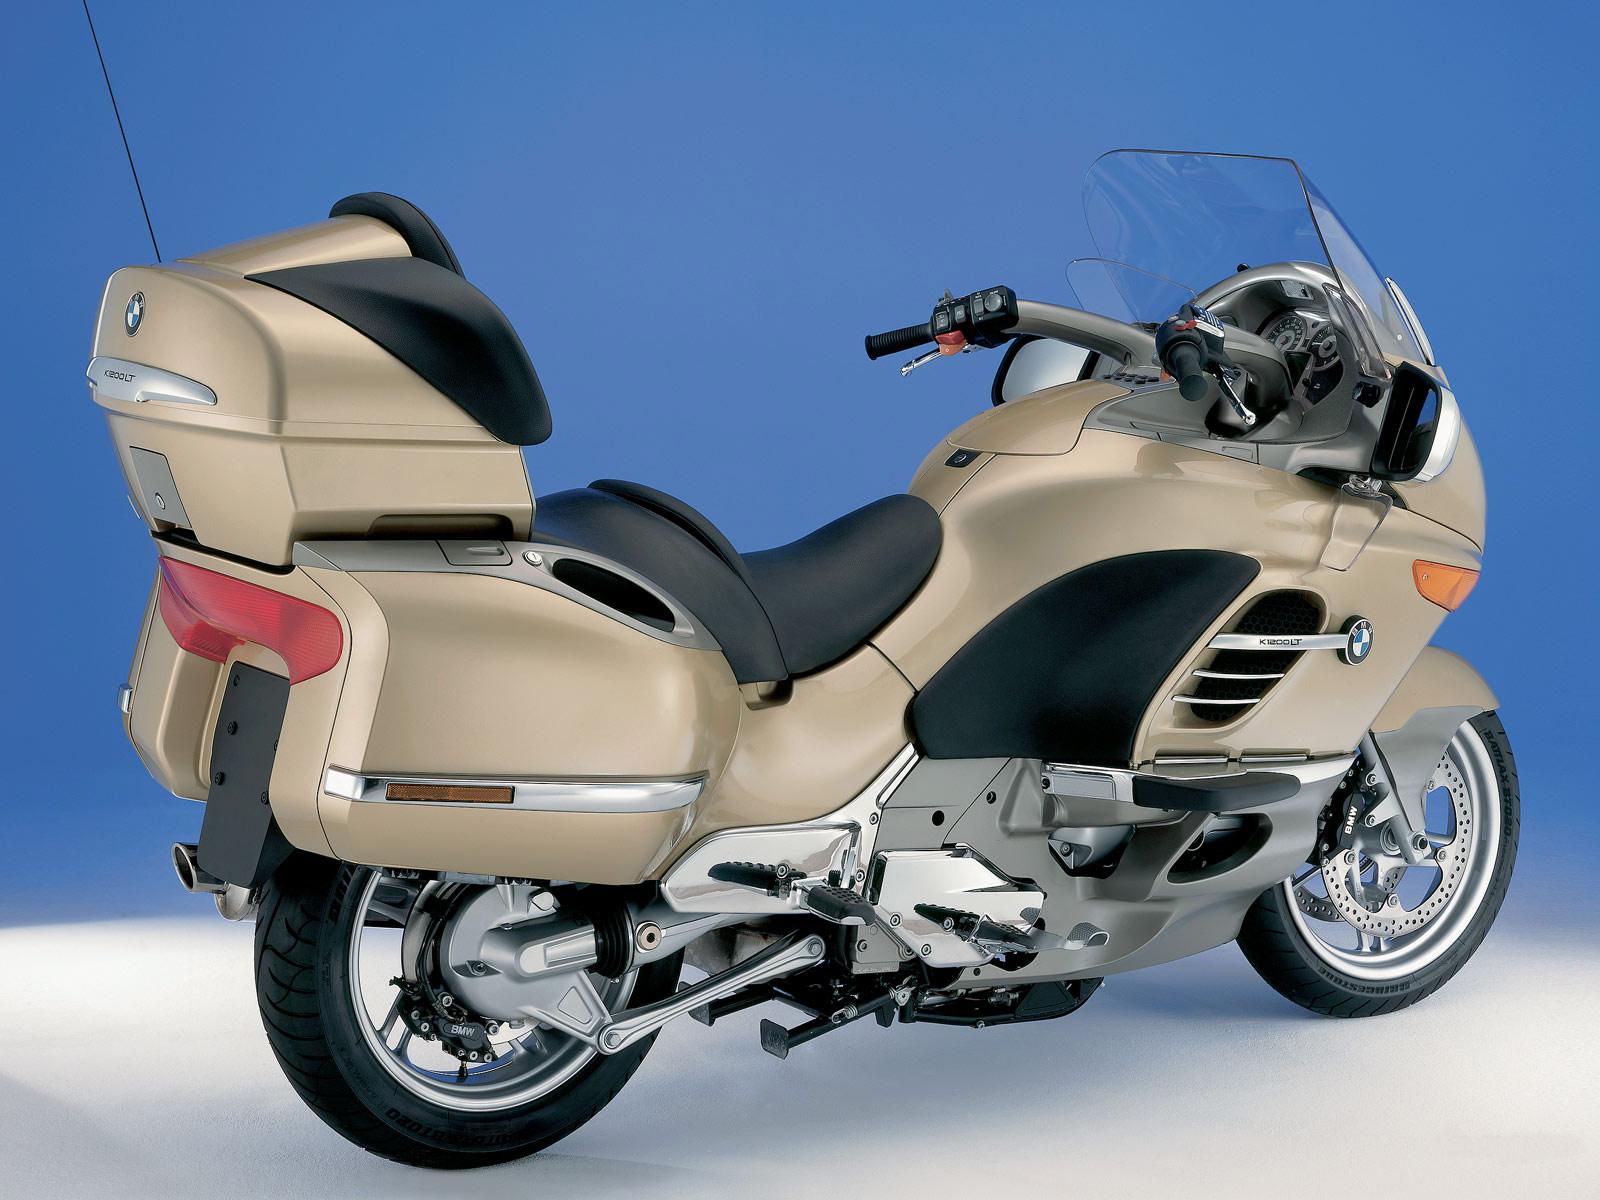 2004 bmw k1200lt motorcycle wallpaper accident lawyers info. Black Bedroom Furniture Sets. Home Design Ideas